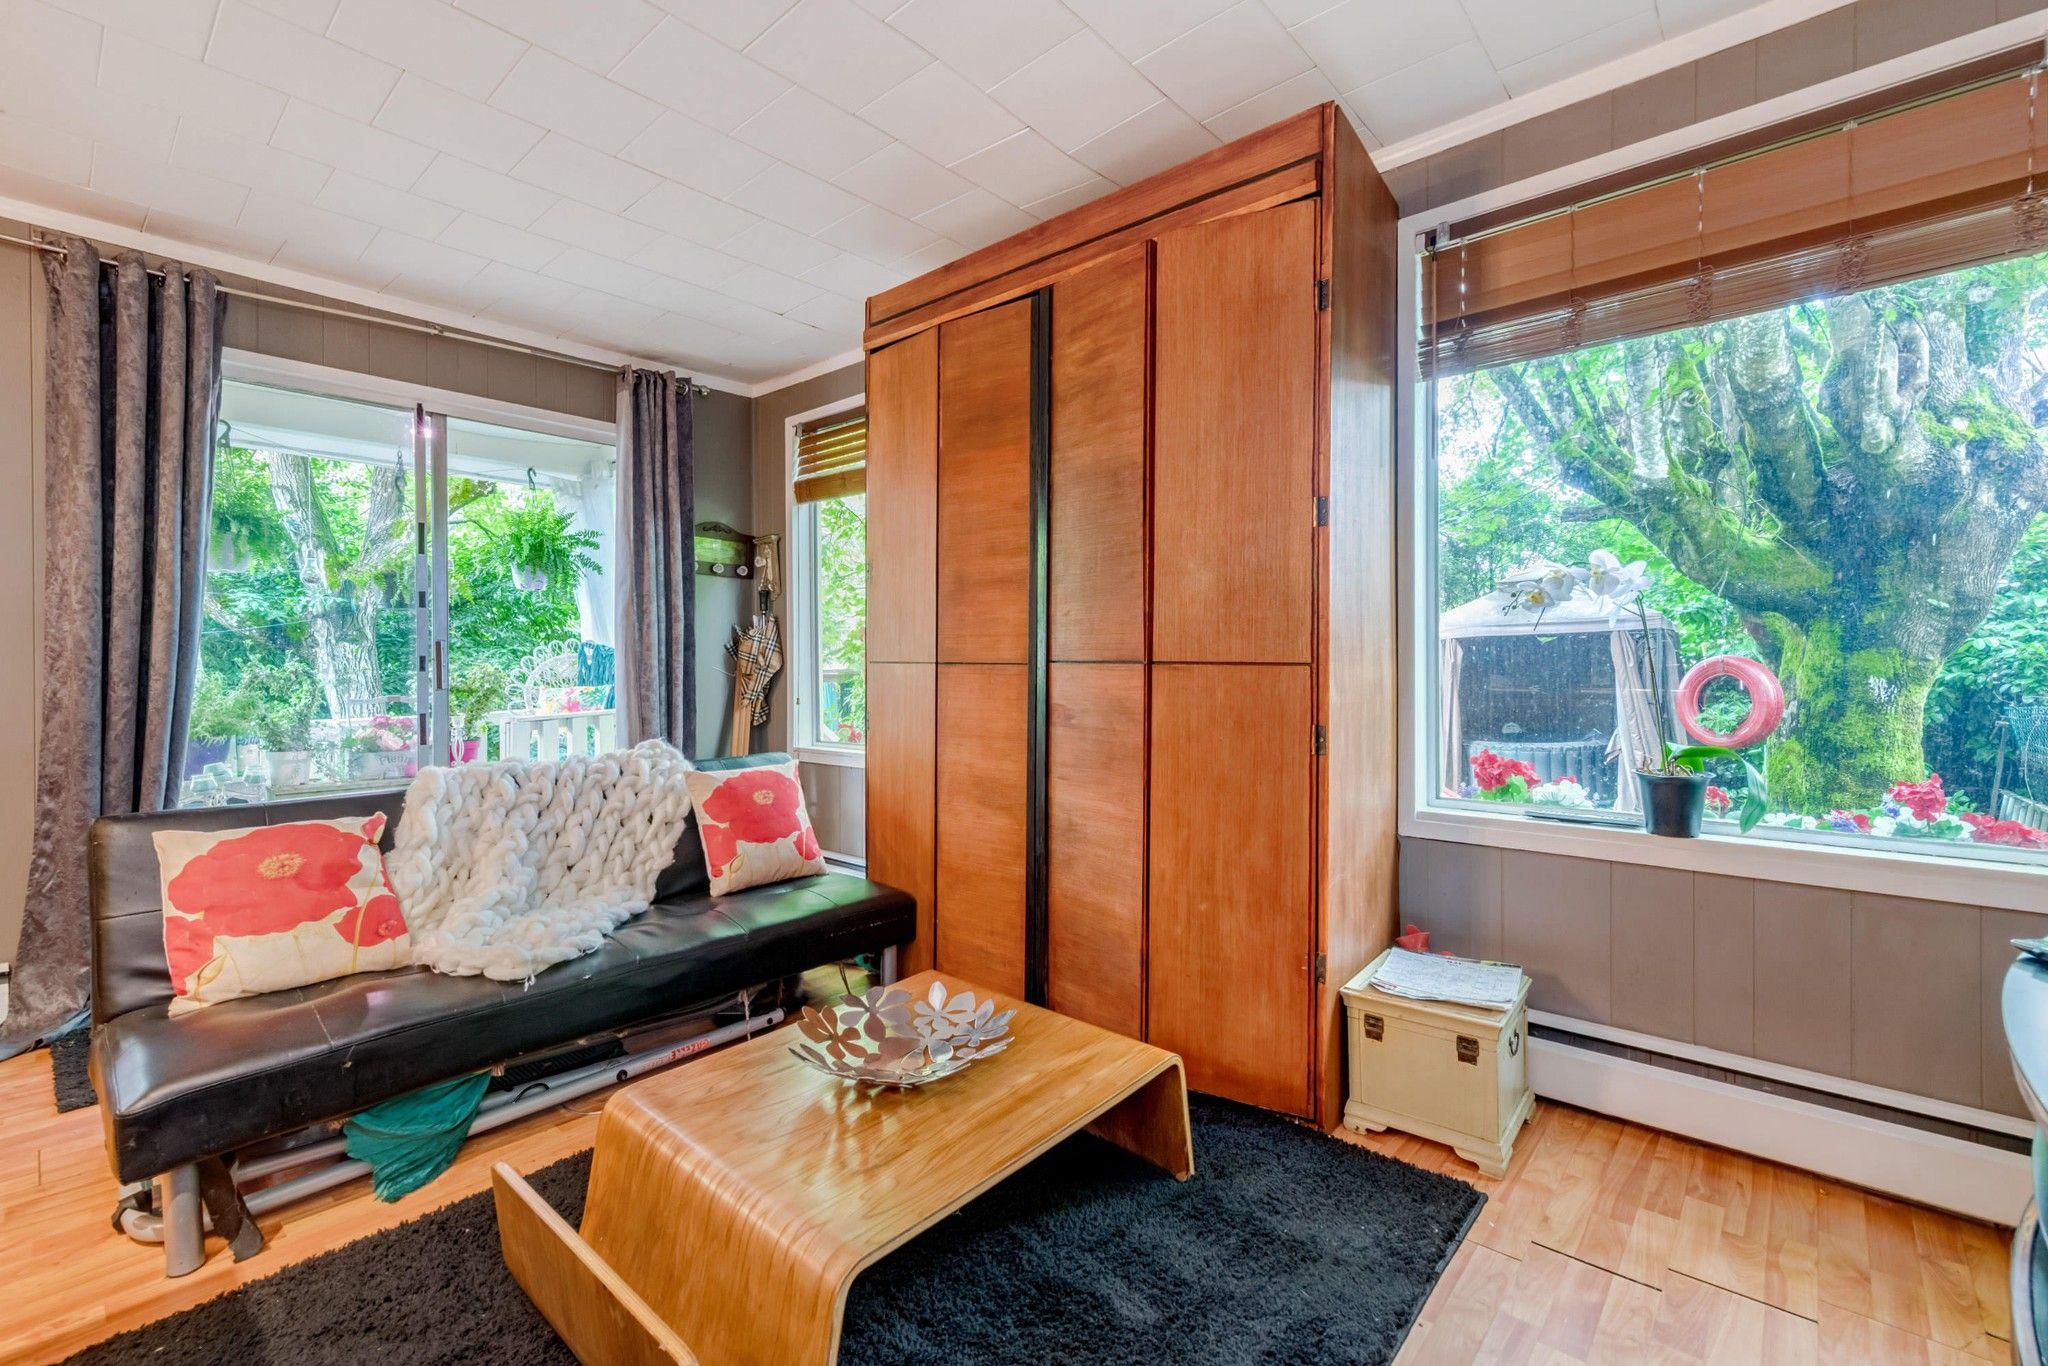 Photo 20: Photos: 20623 114 Avenue in Maple Ridge: Southwest Maple Ridge House for sale : MLS®# R2465656